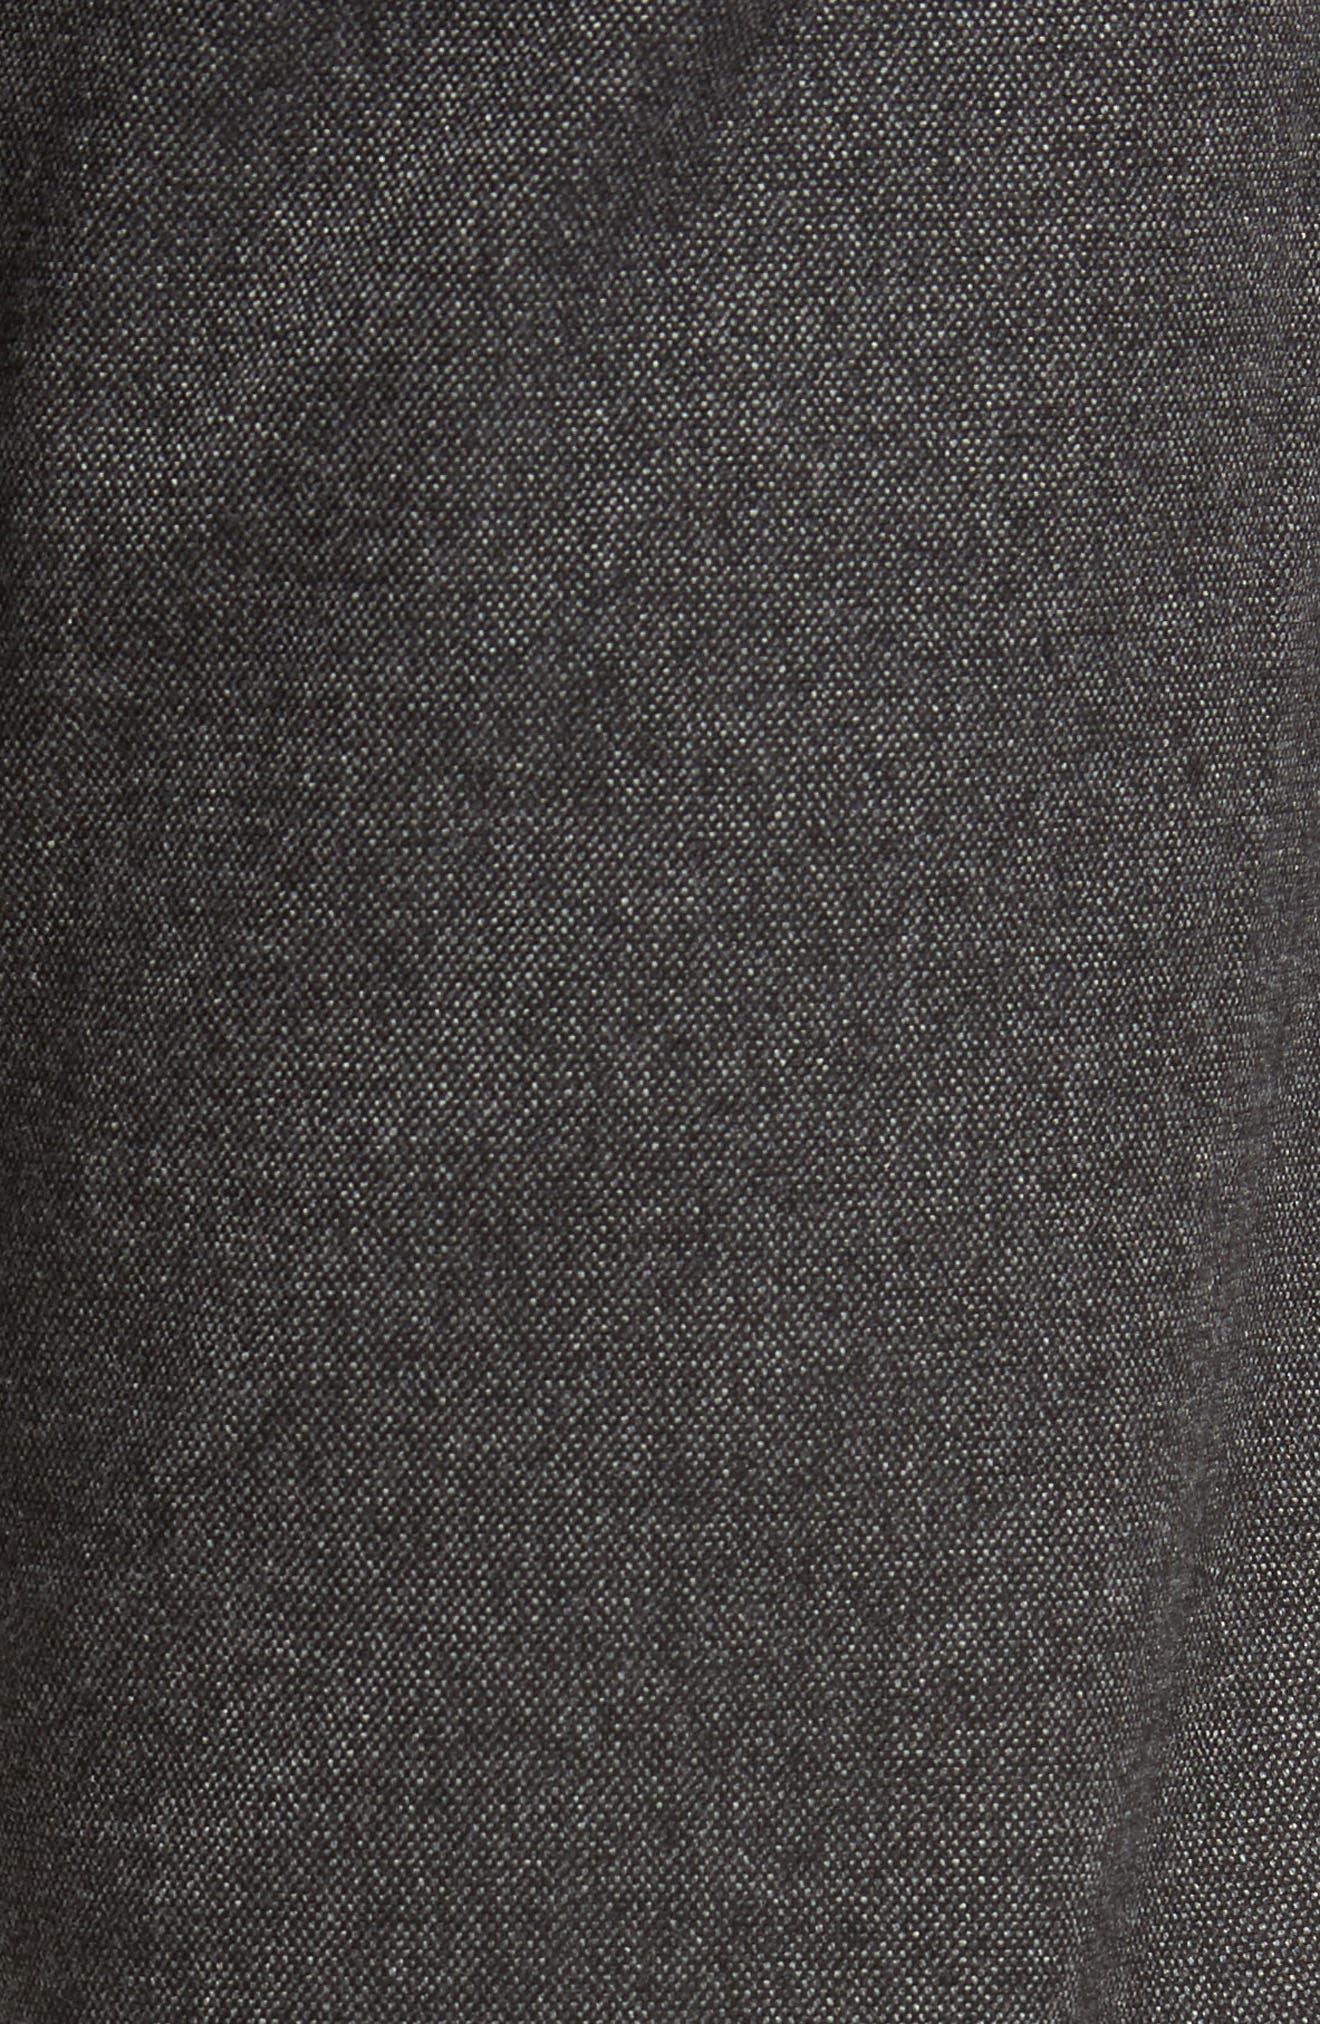 Courage Straight Leg Tweed Pants,                             Alternate thumbnail 5, color,                             020